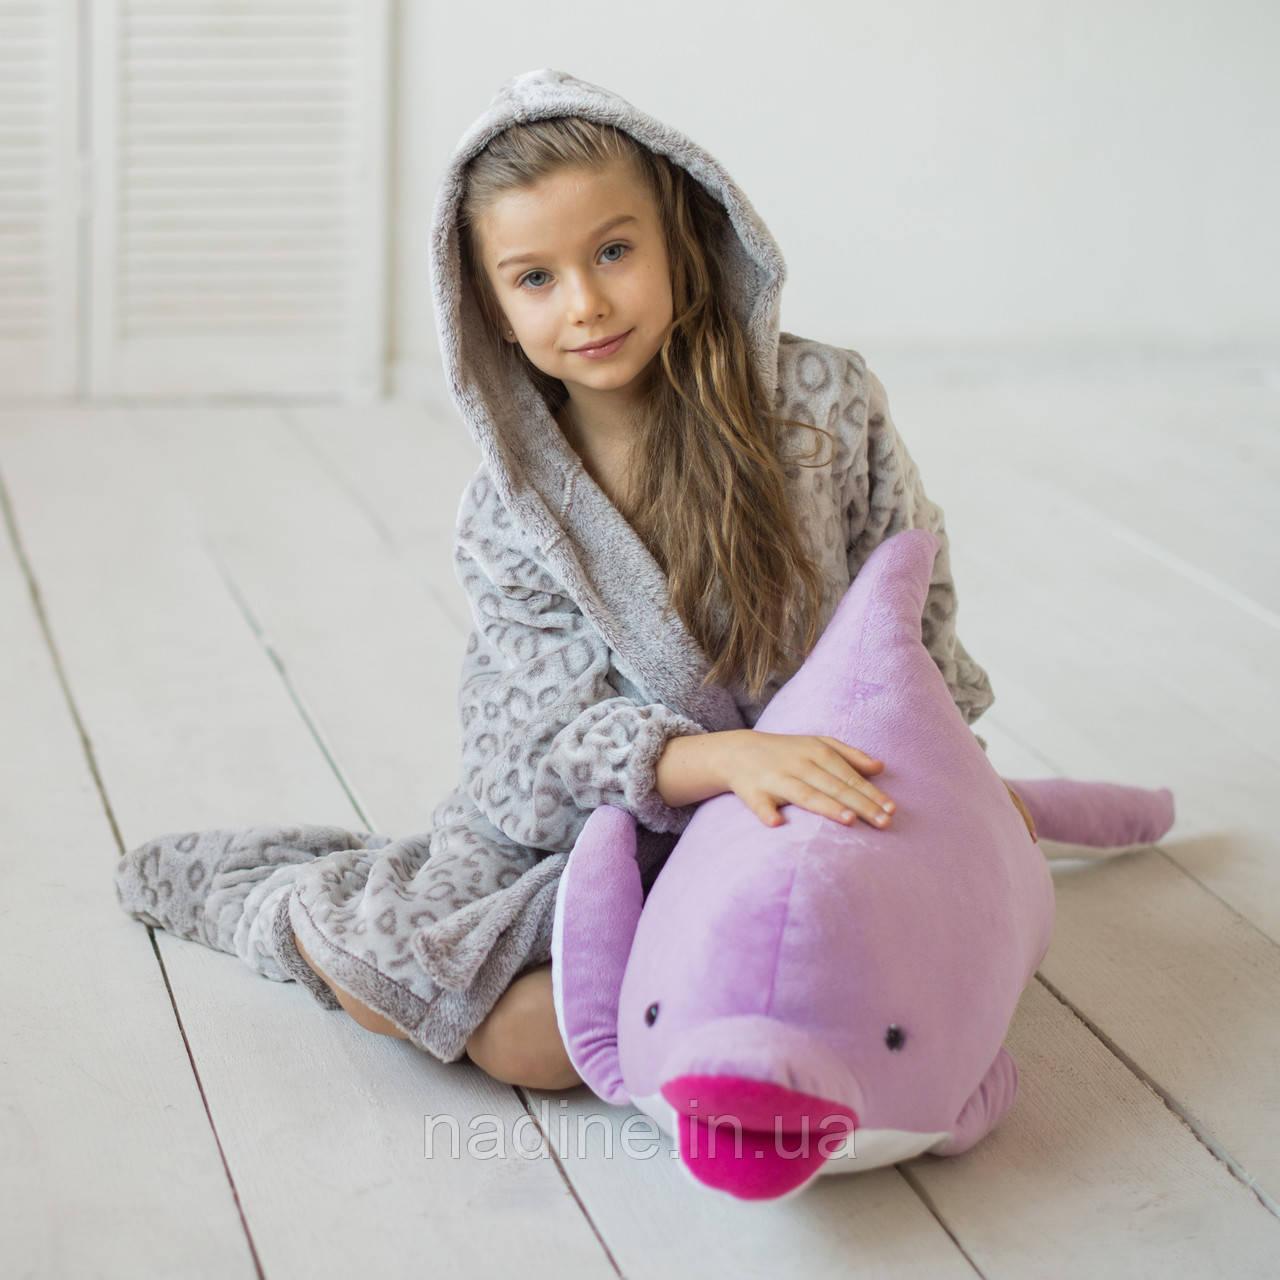 Халат Cream для девочки  Eirena Nadine (28-455) рост 128 бежевый